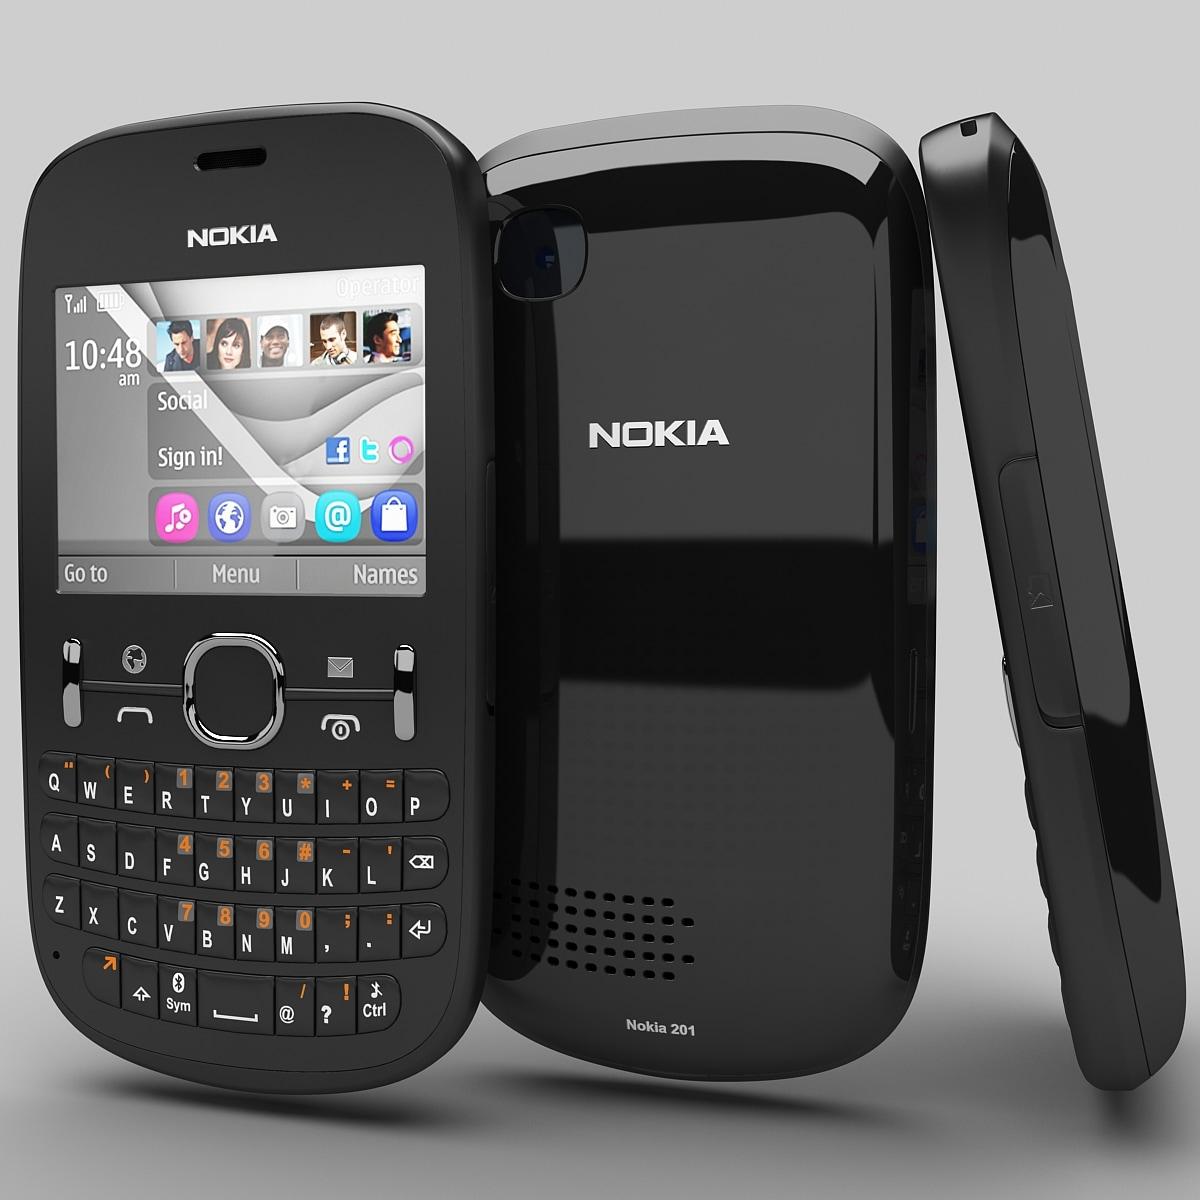 Nokia_Asha_201_Black_001.jpg